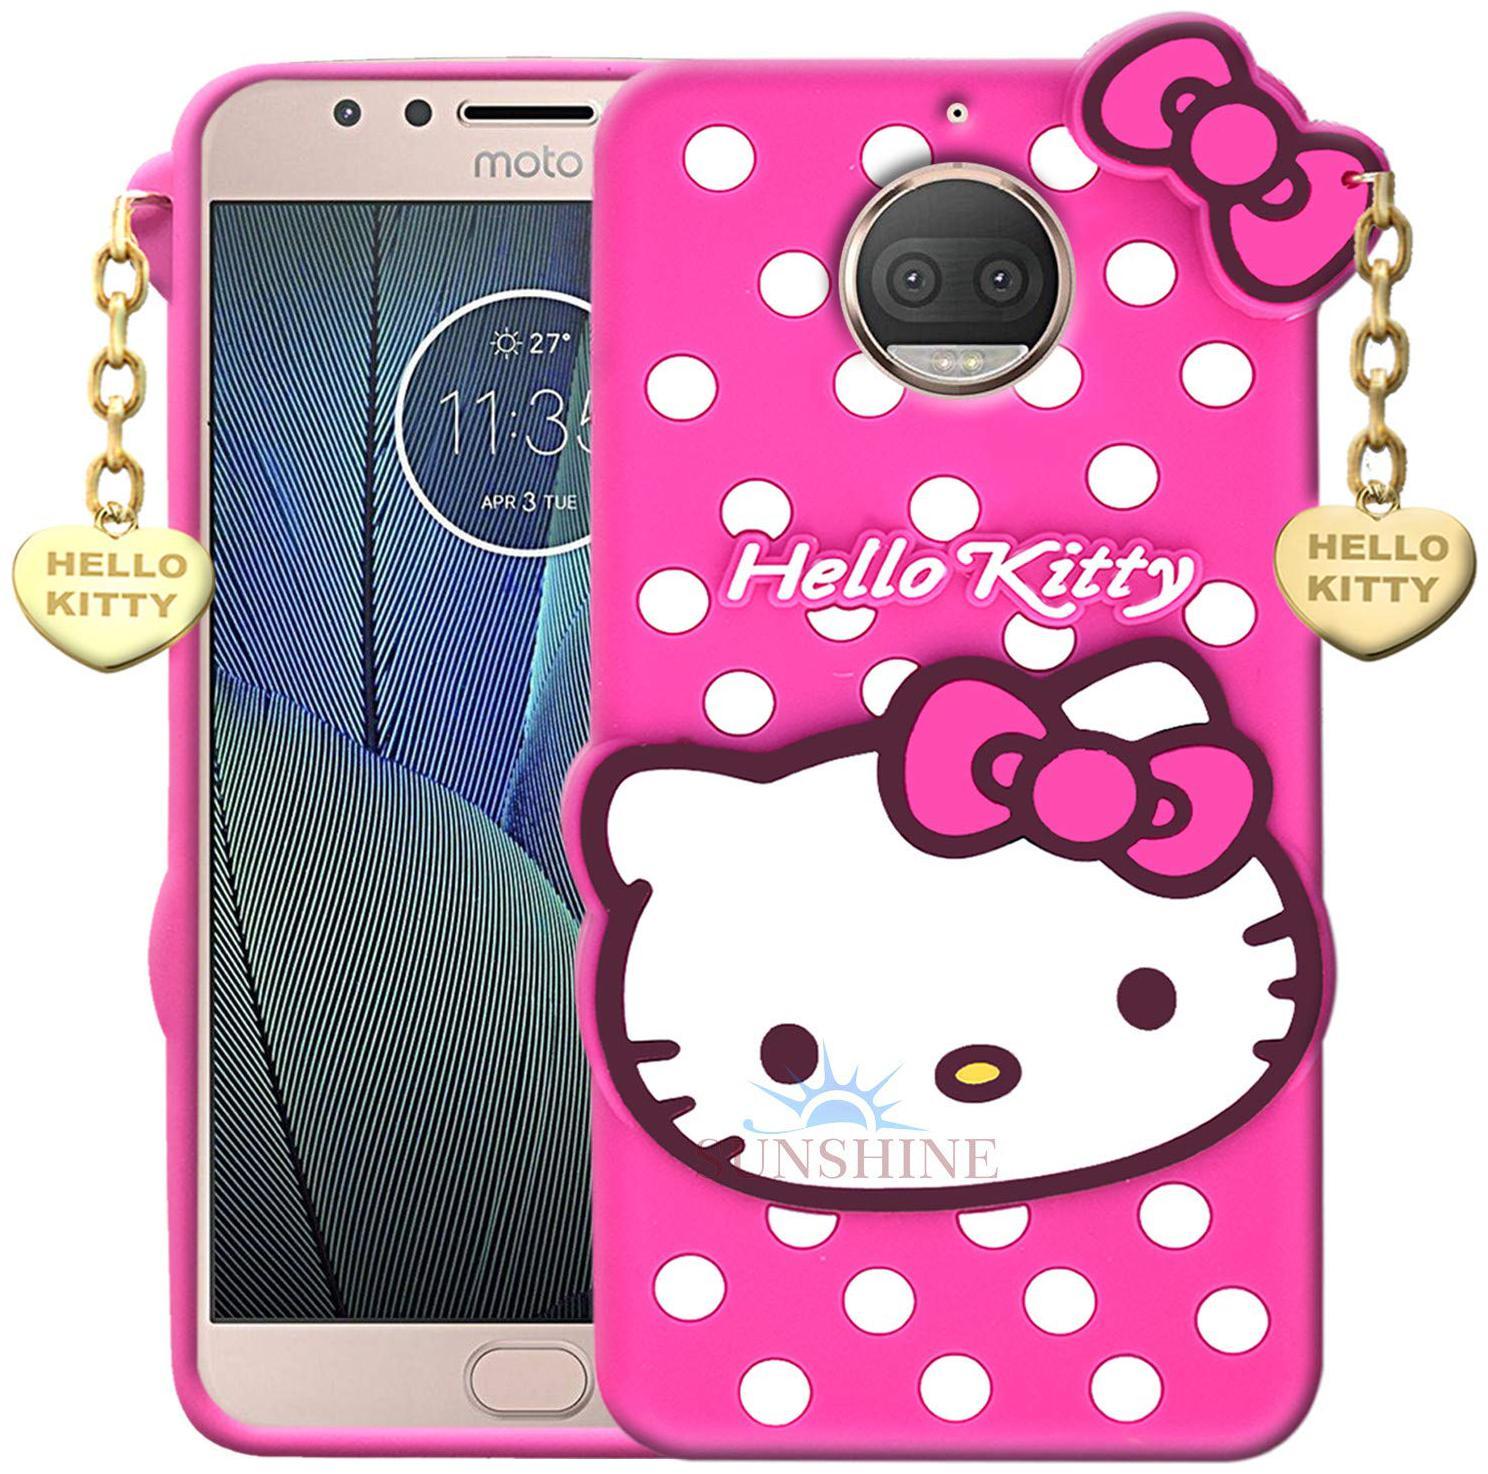 Motorola Moto G5 Plus Silicone Armor Case   Back Cover By EXOTIC FLOURISH   Pink   by Exotic Flourish